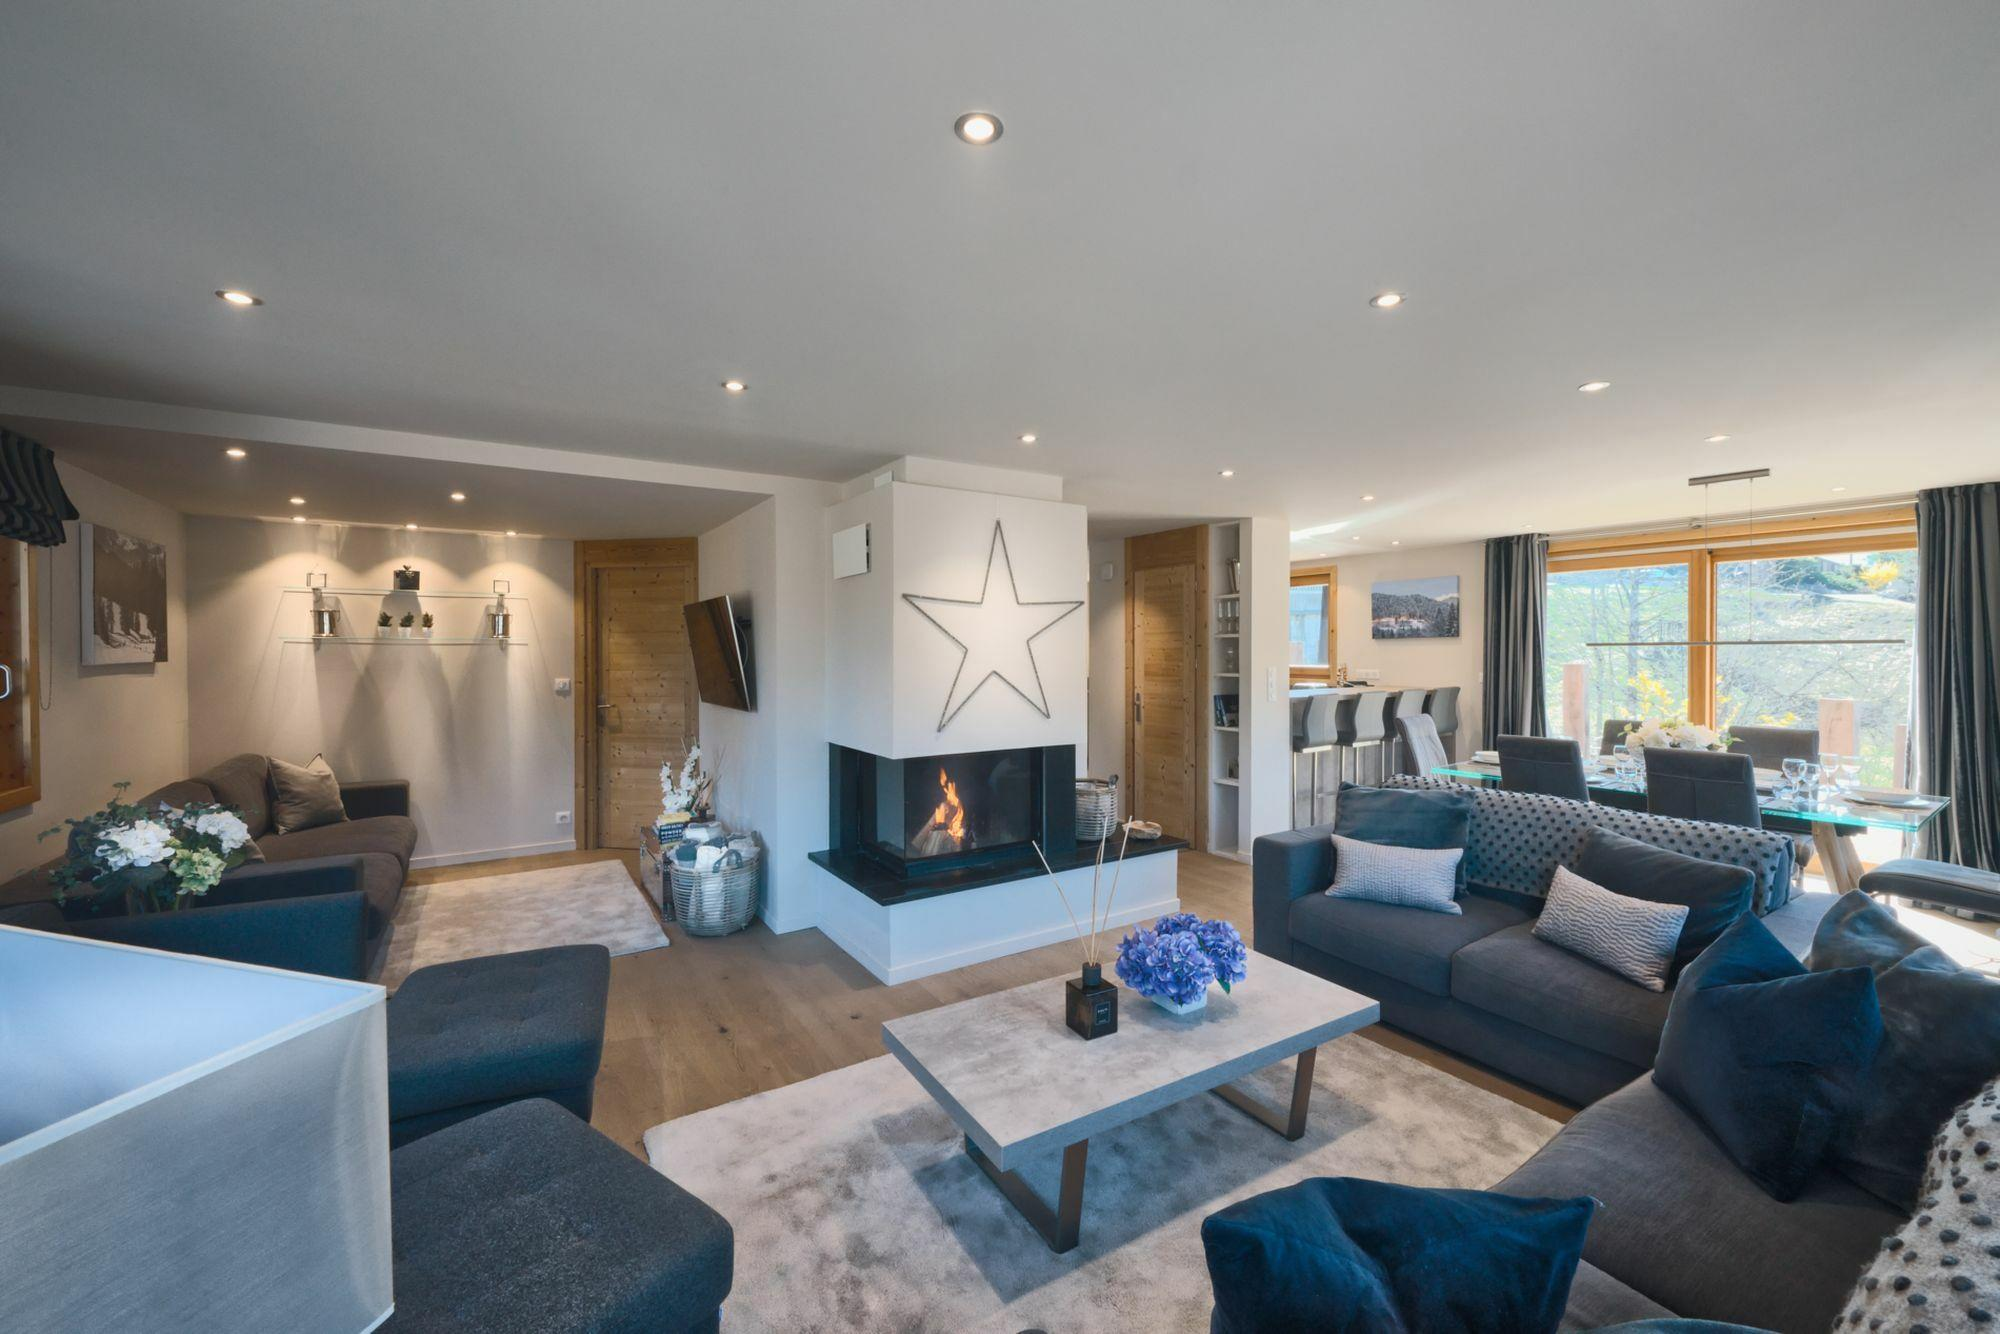 White Accommodation in Morzine